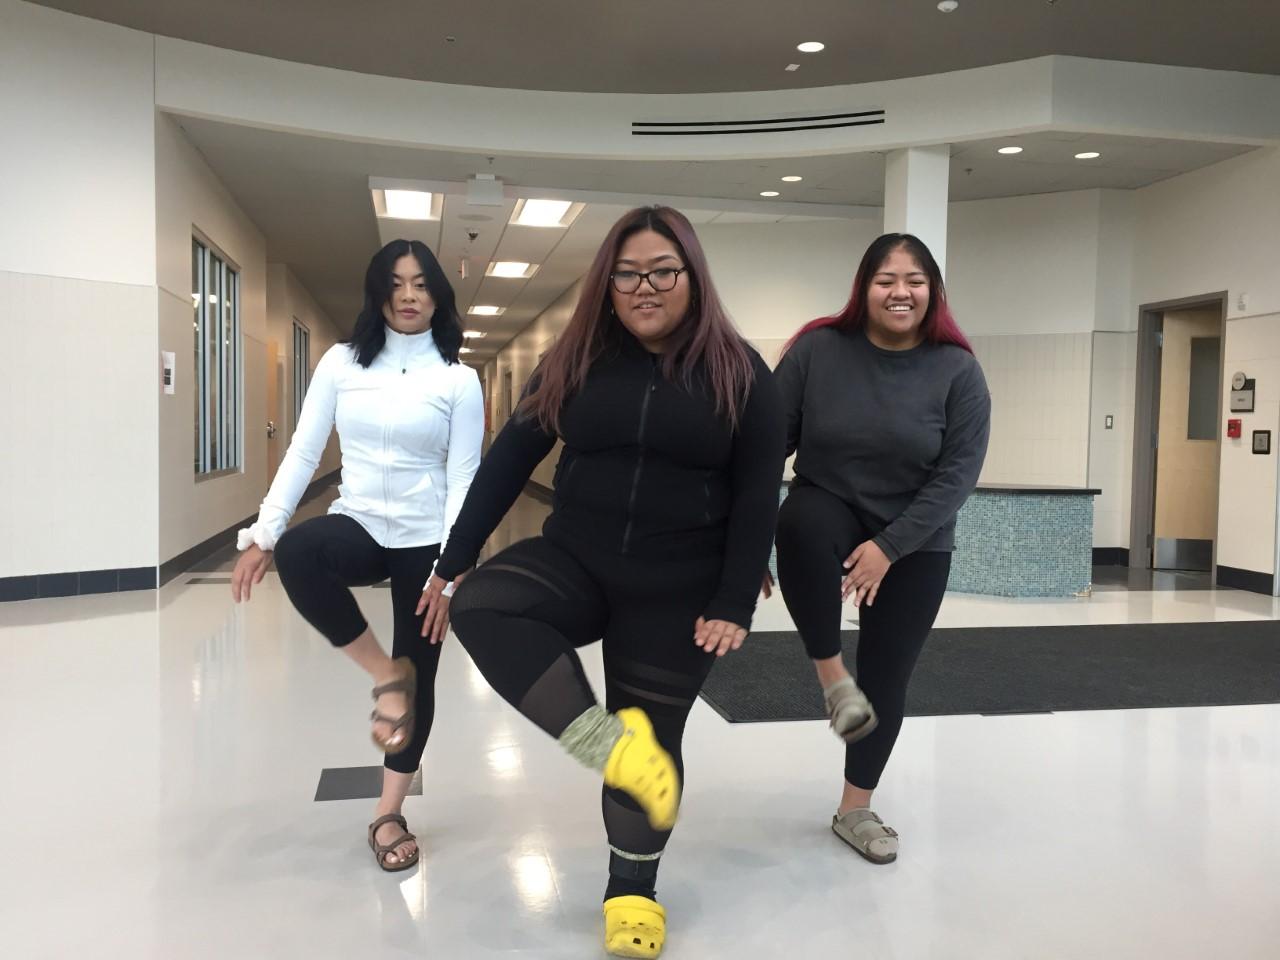 West seniors Shella Elgarico, Daniella Sudaria and Colleen DeLeon practice their moves for a TikTok.